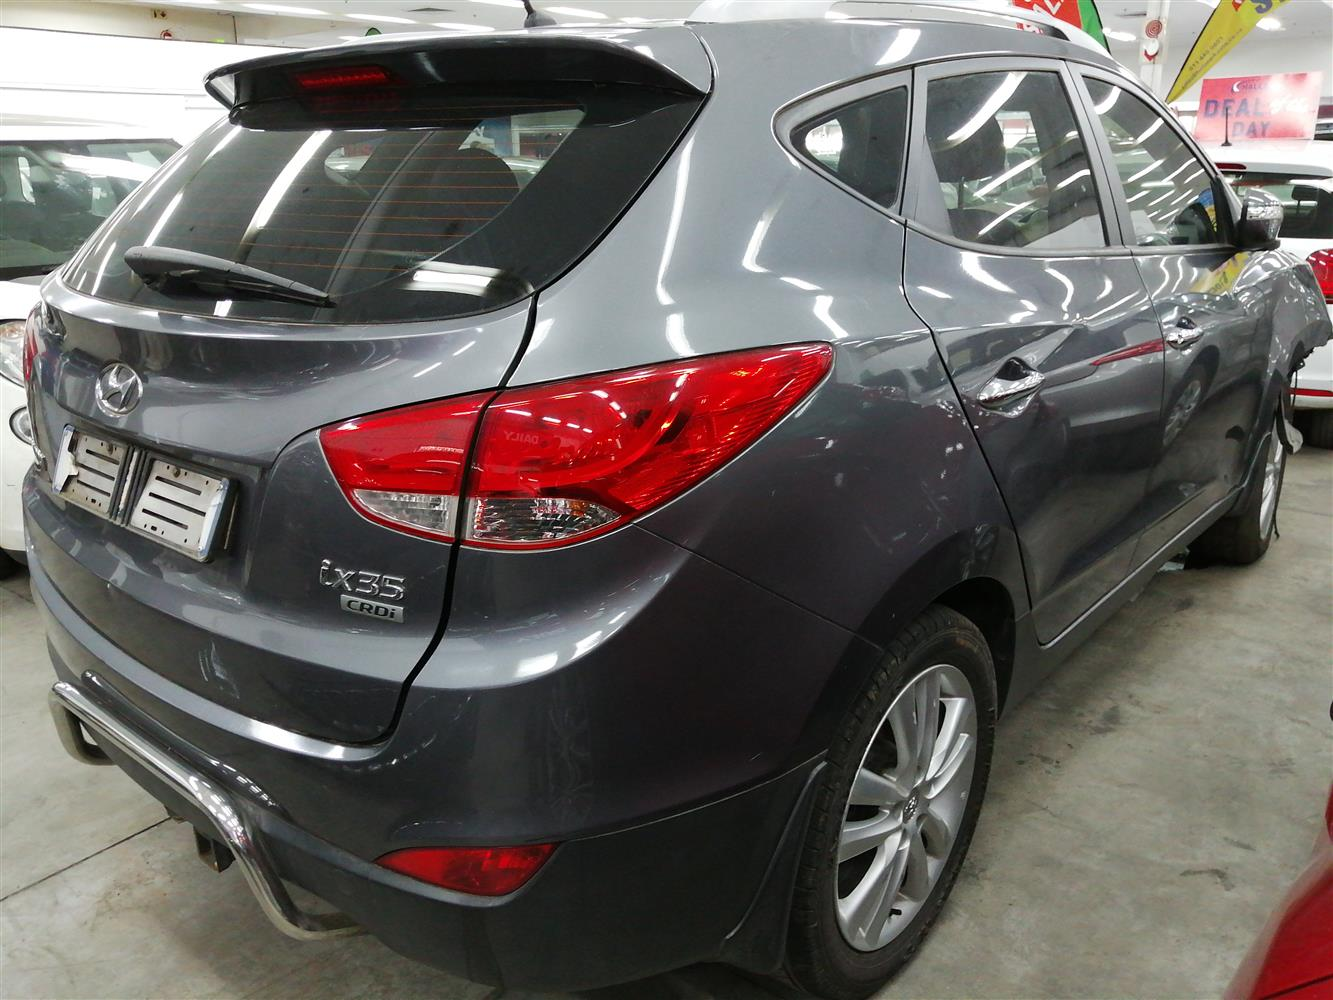 34849 - 2012 Hyundai IX35 R2.0 CRDI GLS Code 3